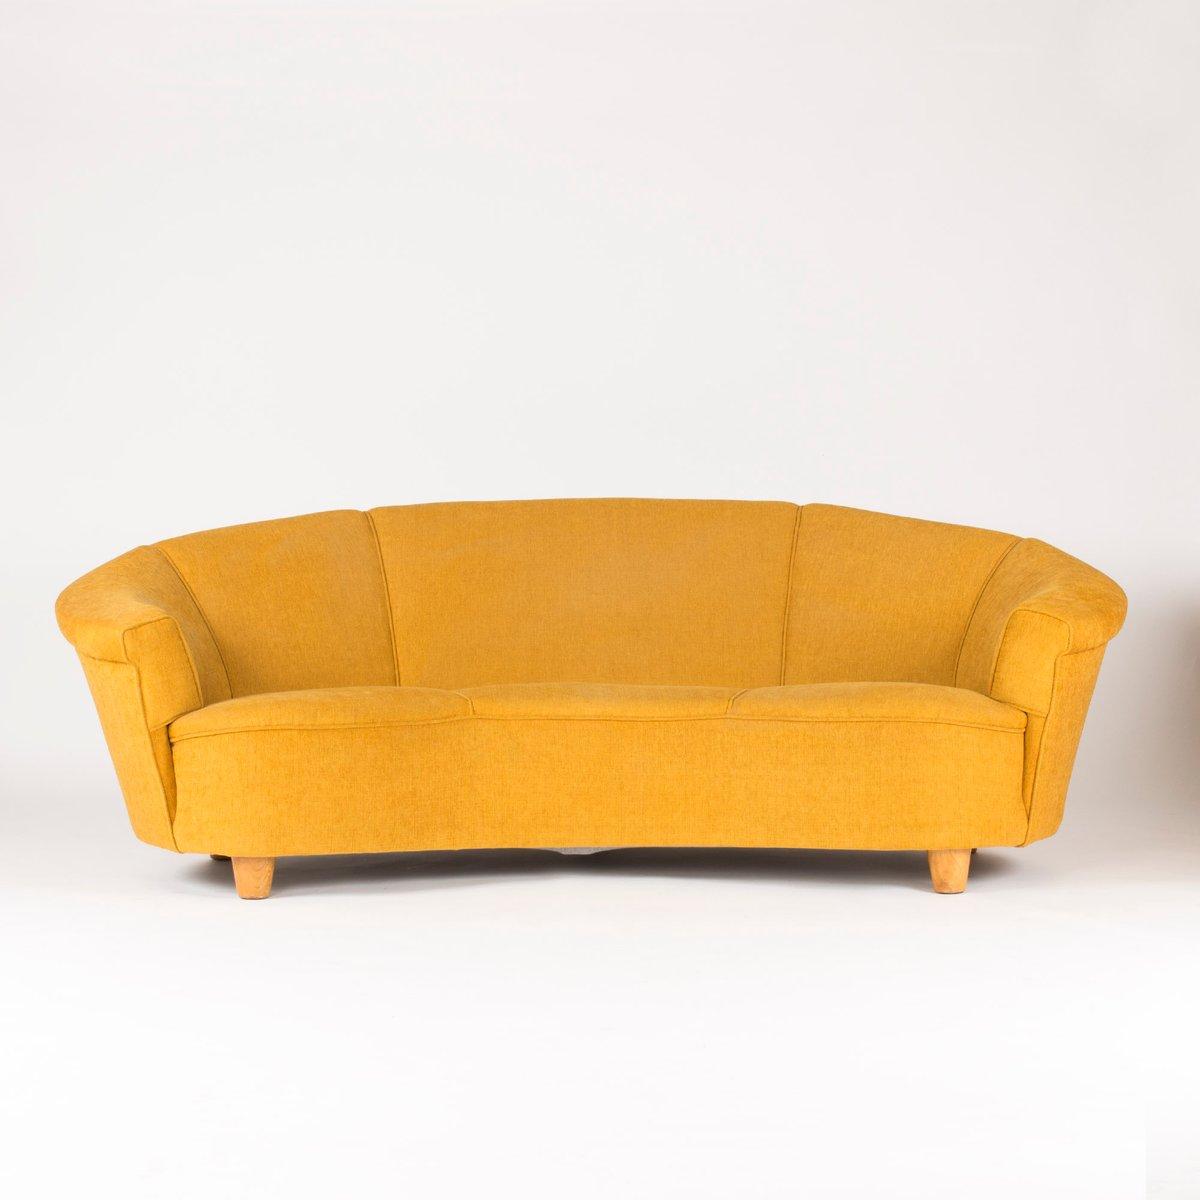 Swedish sofa 1930s for sale at pamono for Swedish sofa